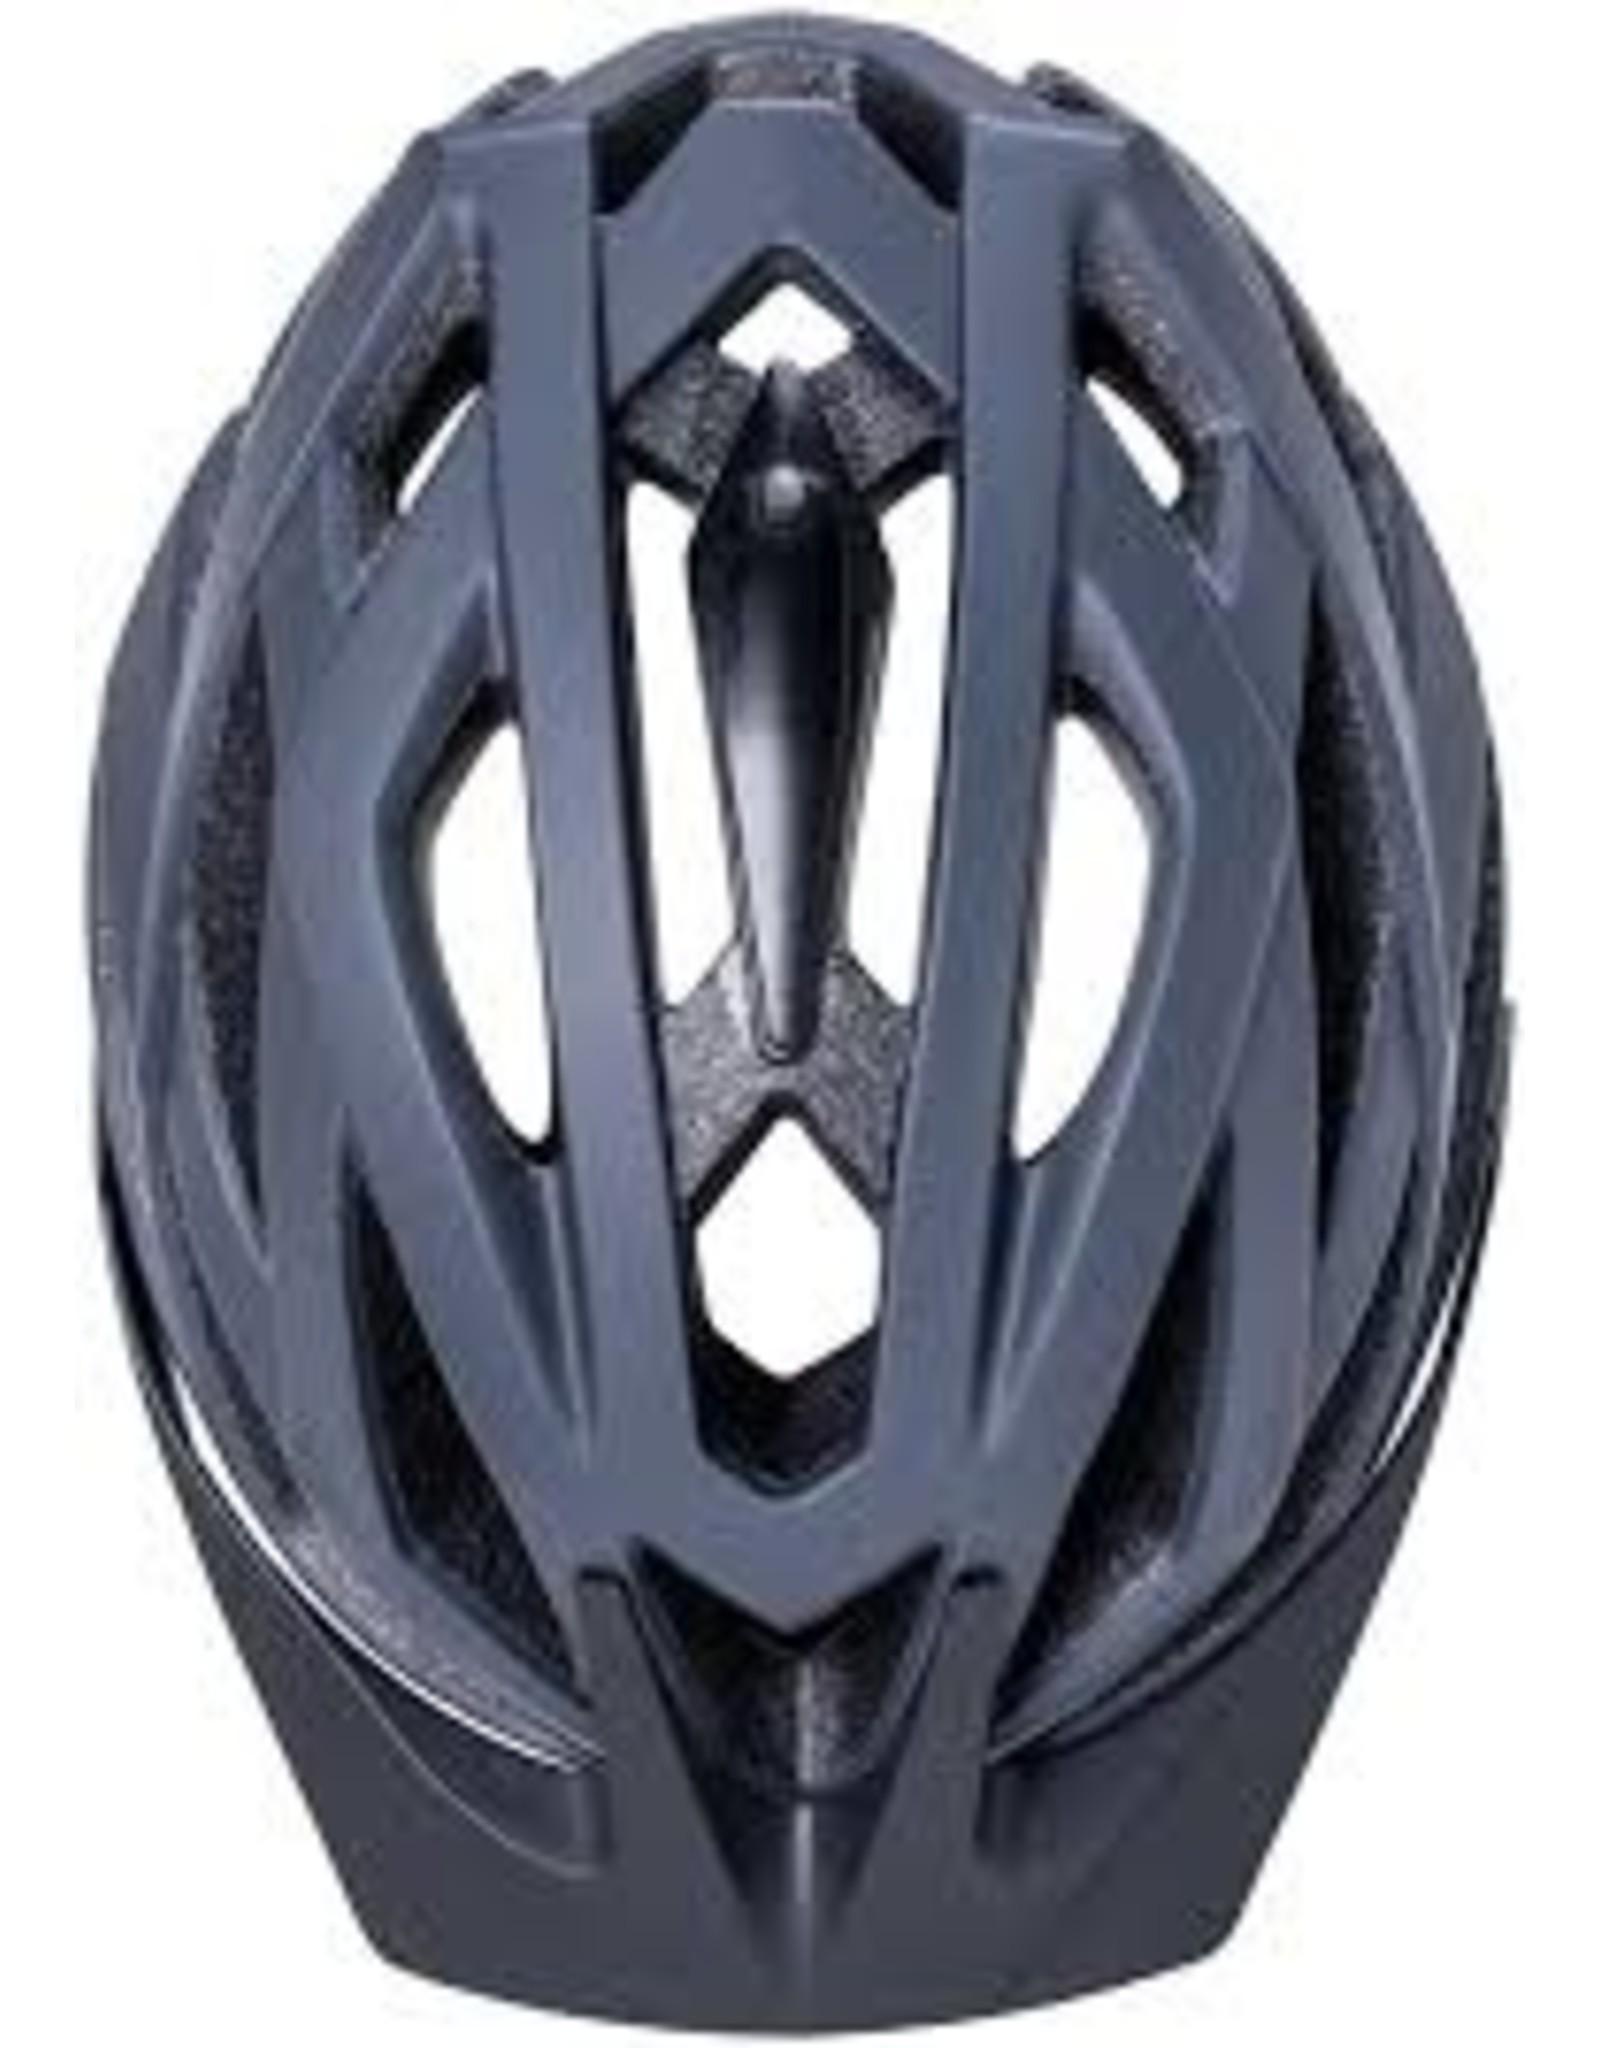 Kali Protectives Lunati Sync Helmet - Matte Navy/Yellow, Small/Medium